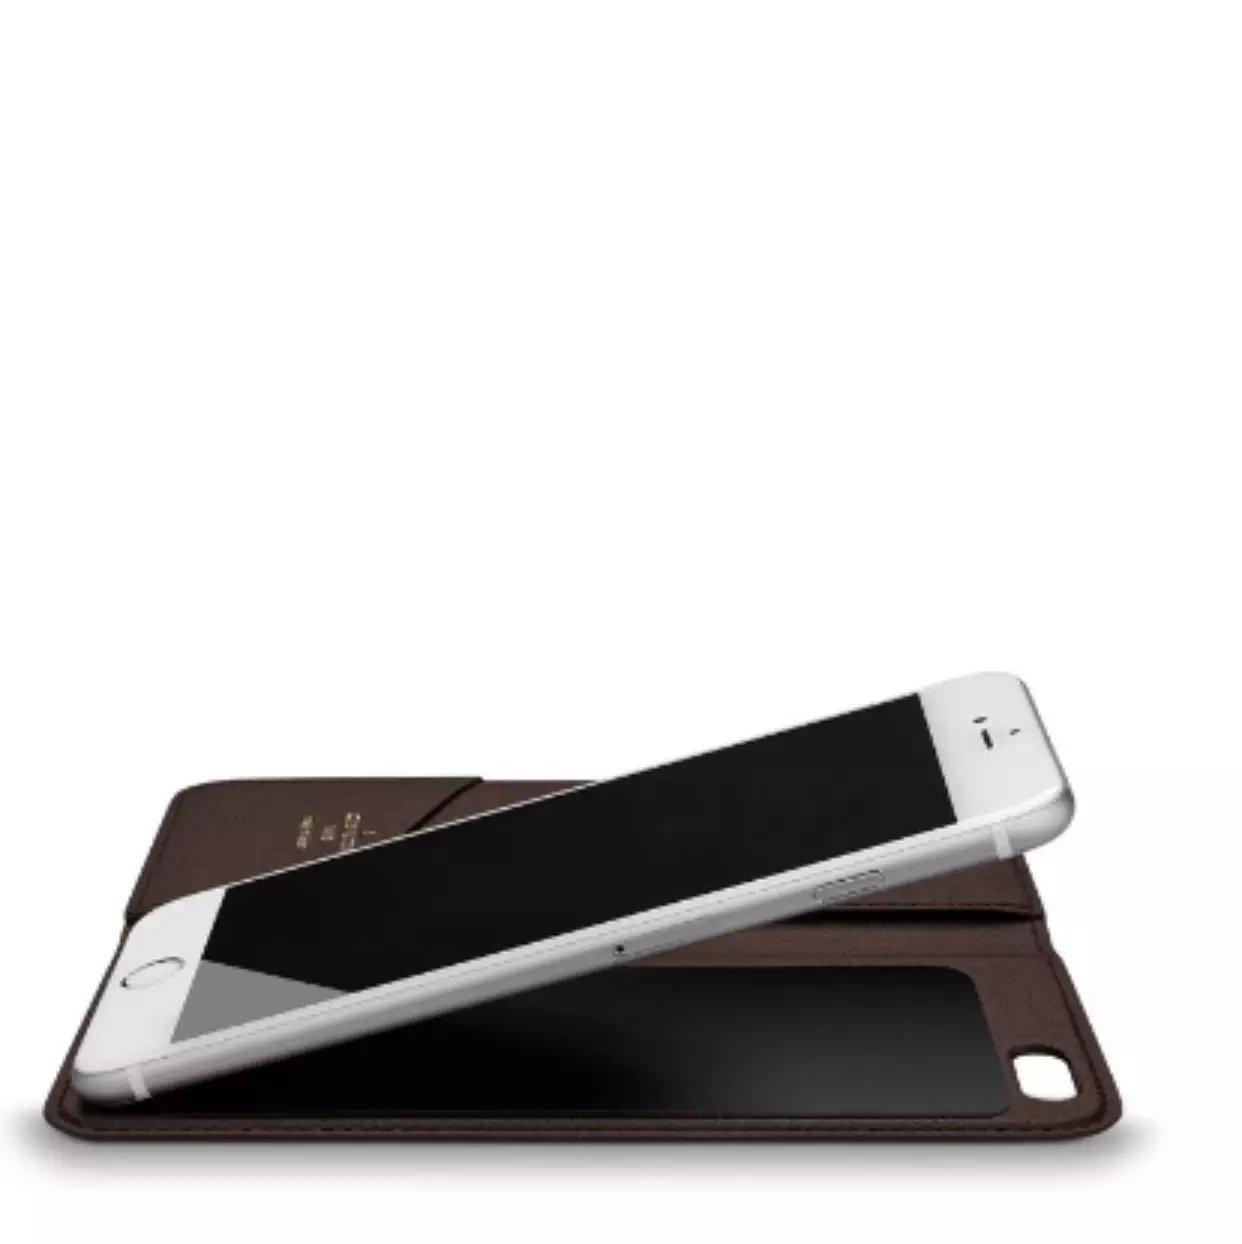 iphone hülle eigenes foto iphone hülle gestalten Louis Vuitton iphone 8 Plus hüllen smartphone schutzhülle 8 Pluslbst gestalten leder flip ca8 Plus iphone 8 Plus hülle leder iphone 8 Plus ausgefallene handyhüllen schutzhülle für iphone iphone hülle foto